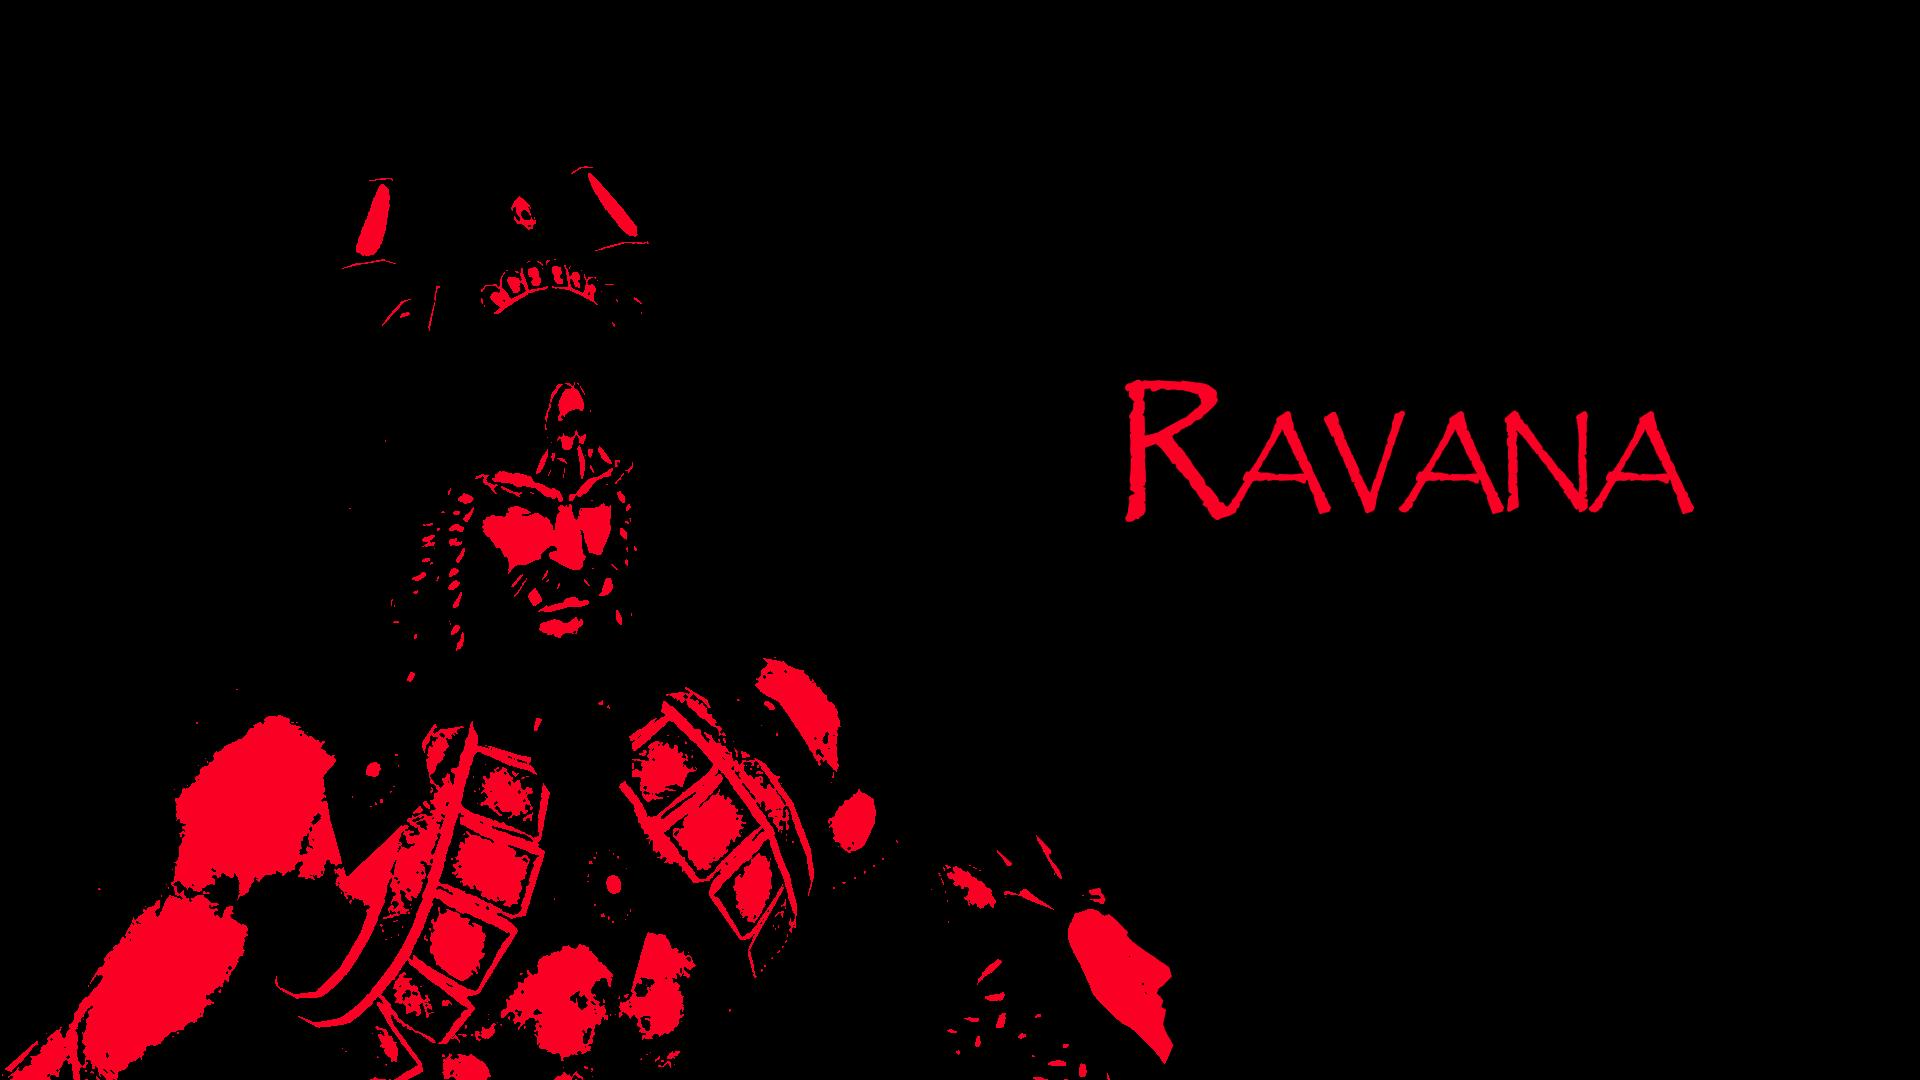 Here Are The 11 Promising Traits Of Ultimate Villain RAVANA